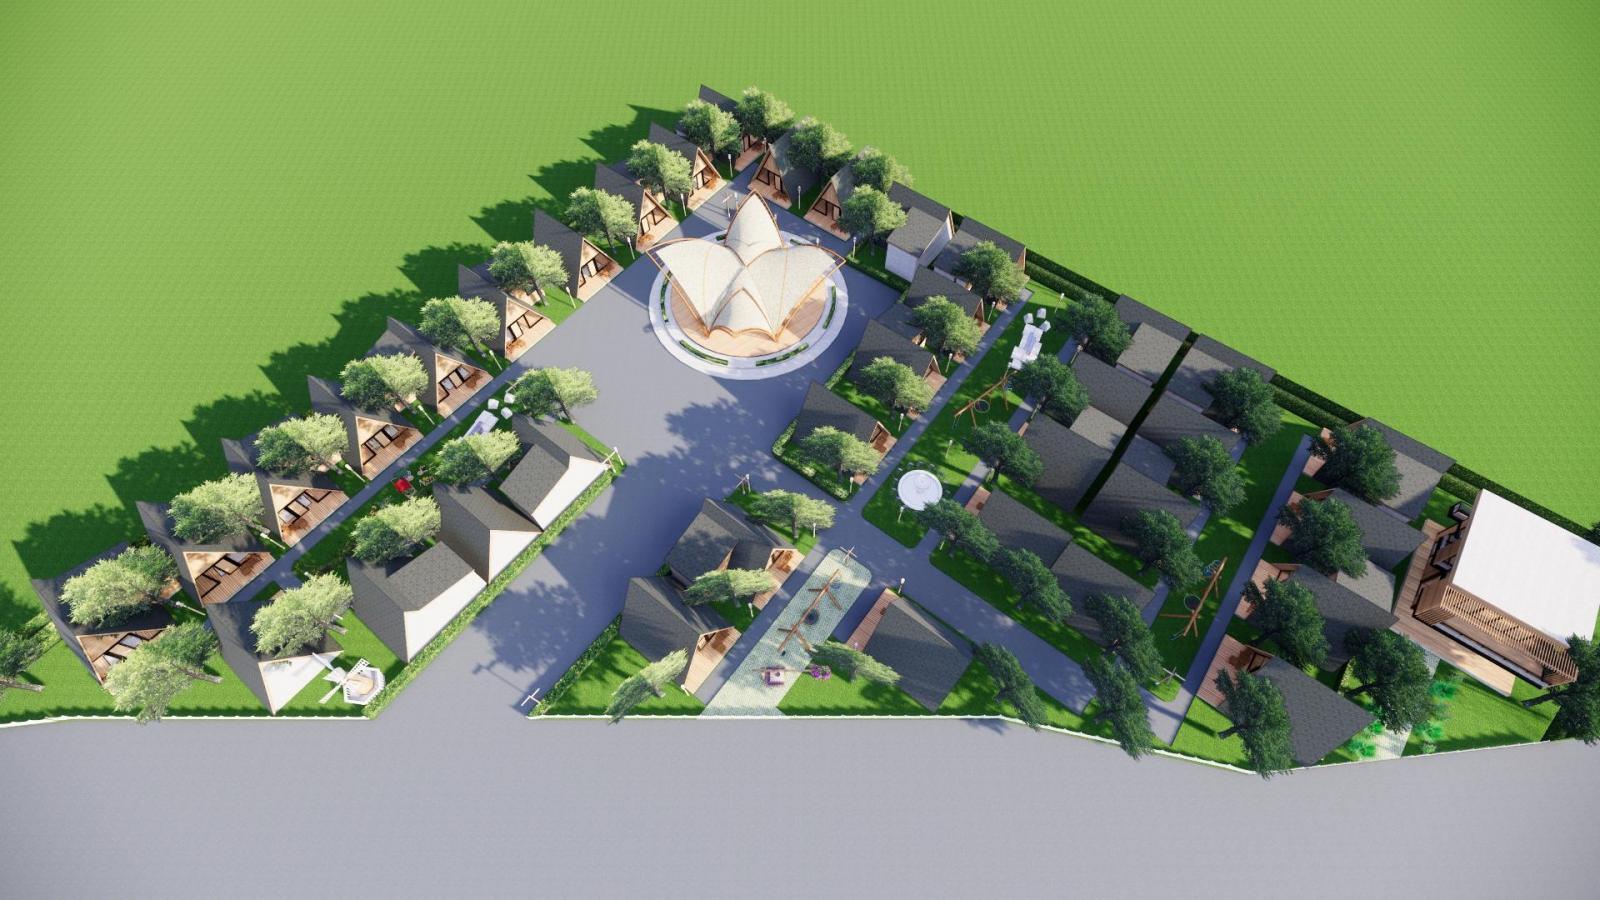 Phối cảnh dự án Long Mỹ Ocean Garden View